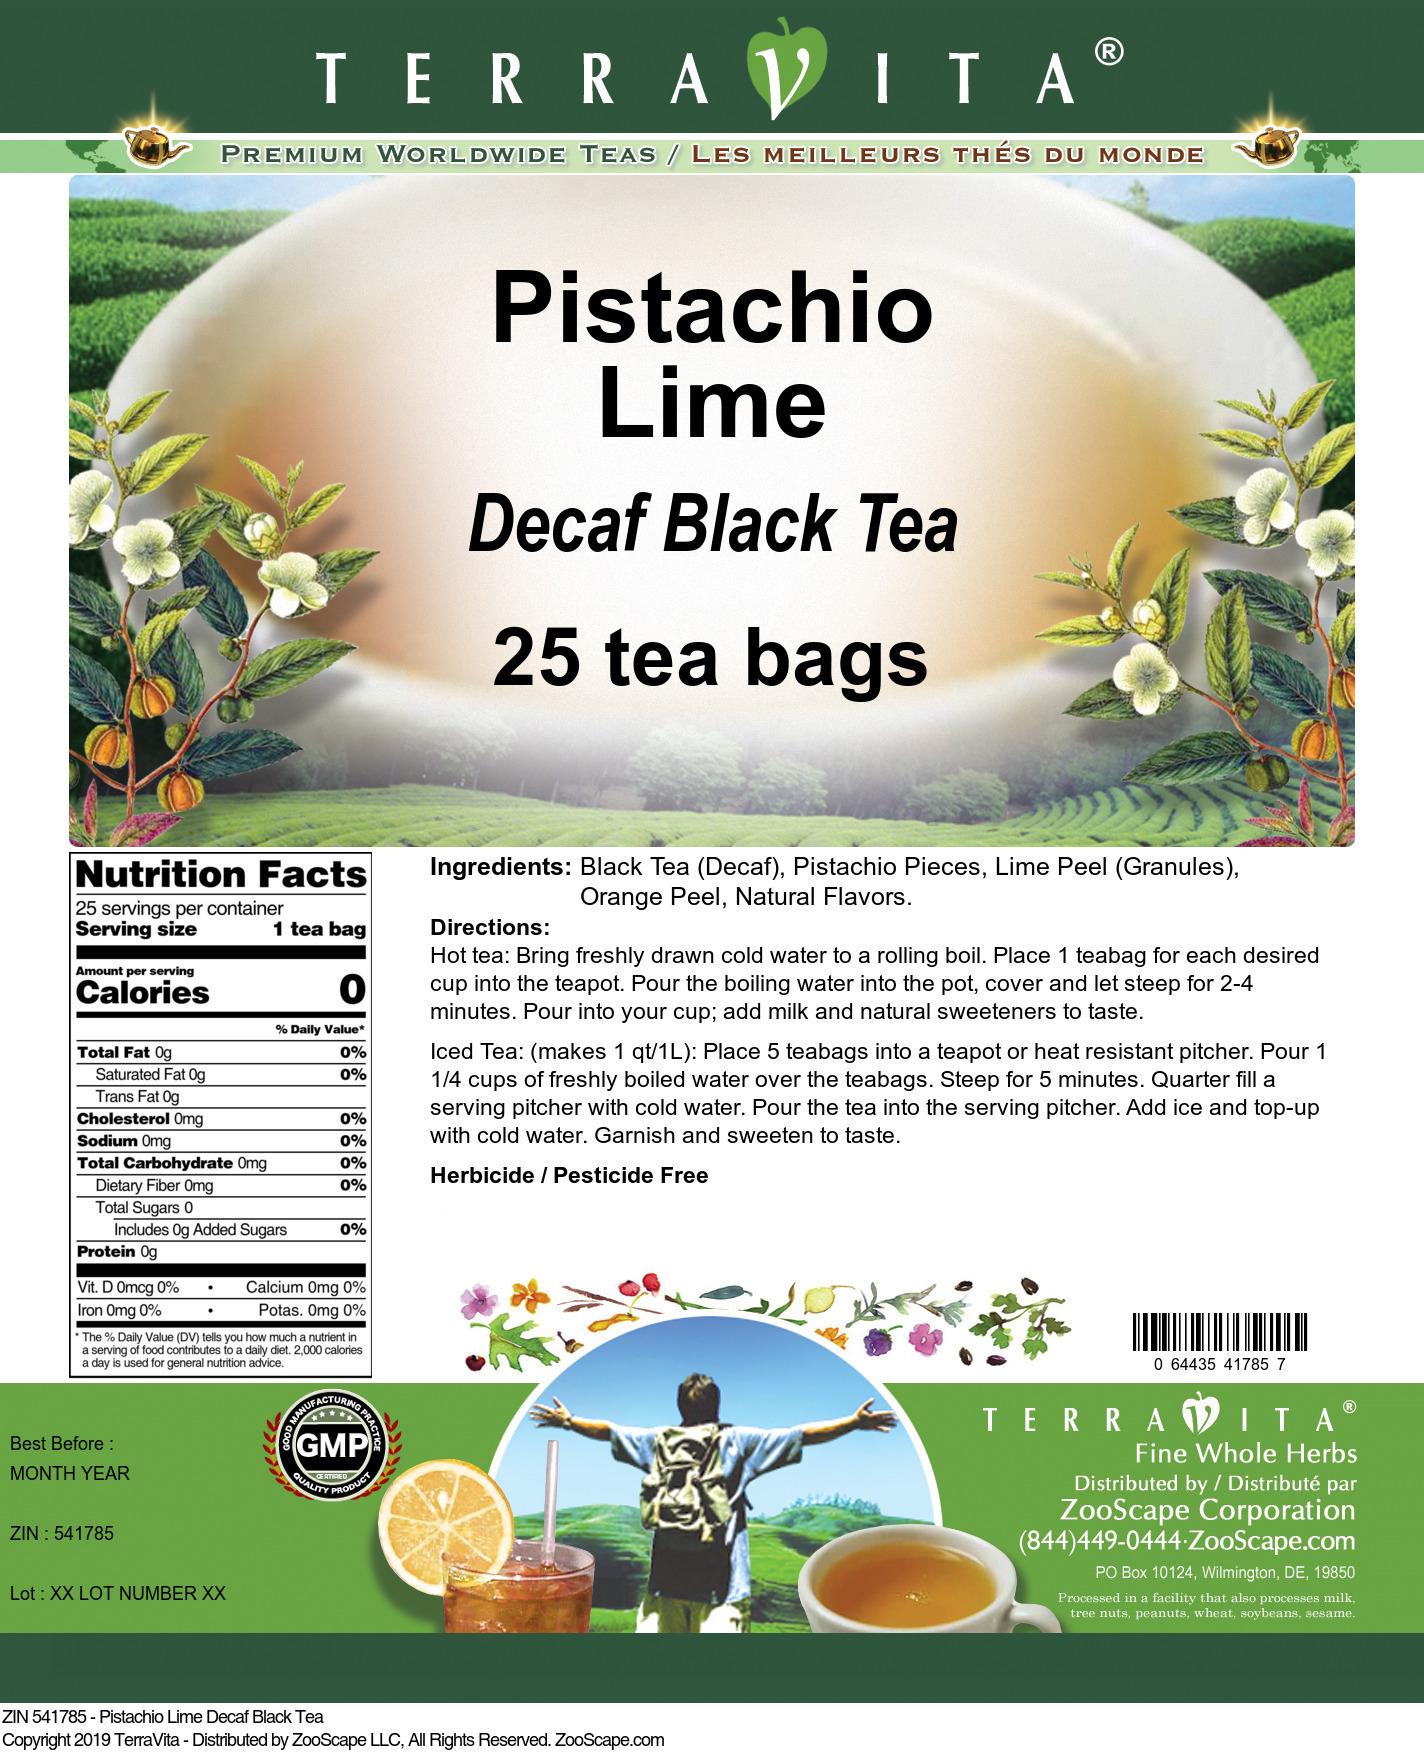 Pistachio Lime Decaf Black Tea